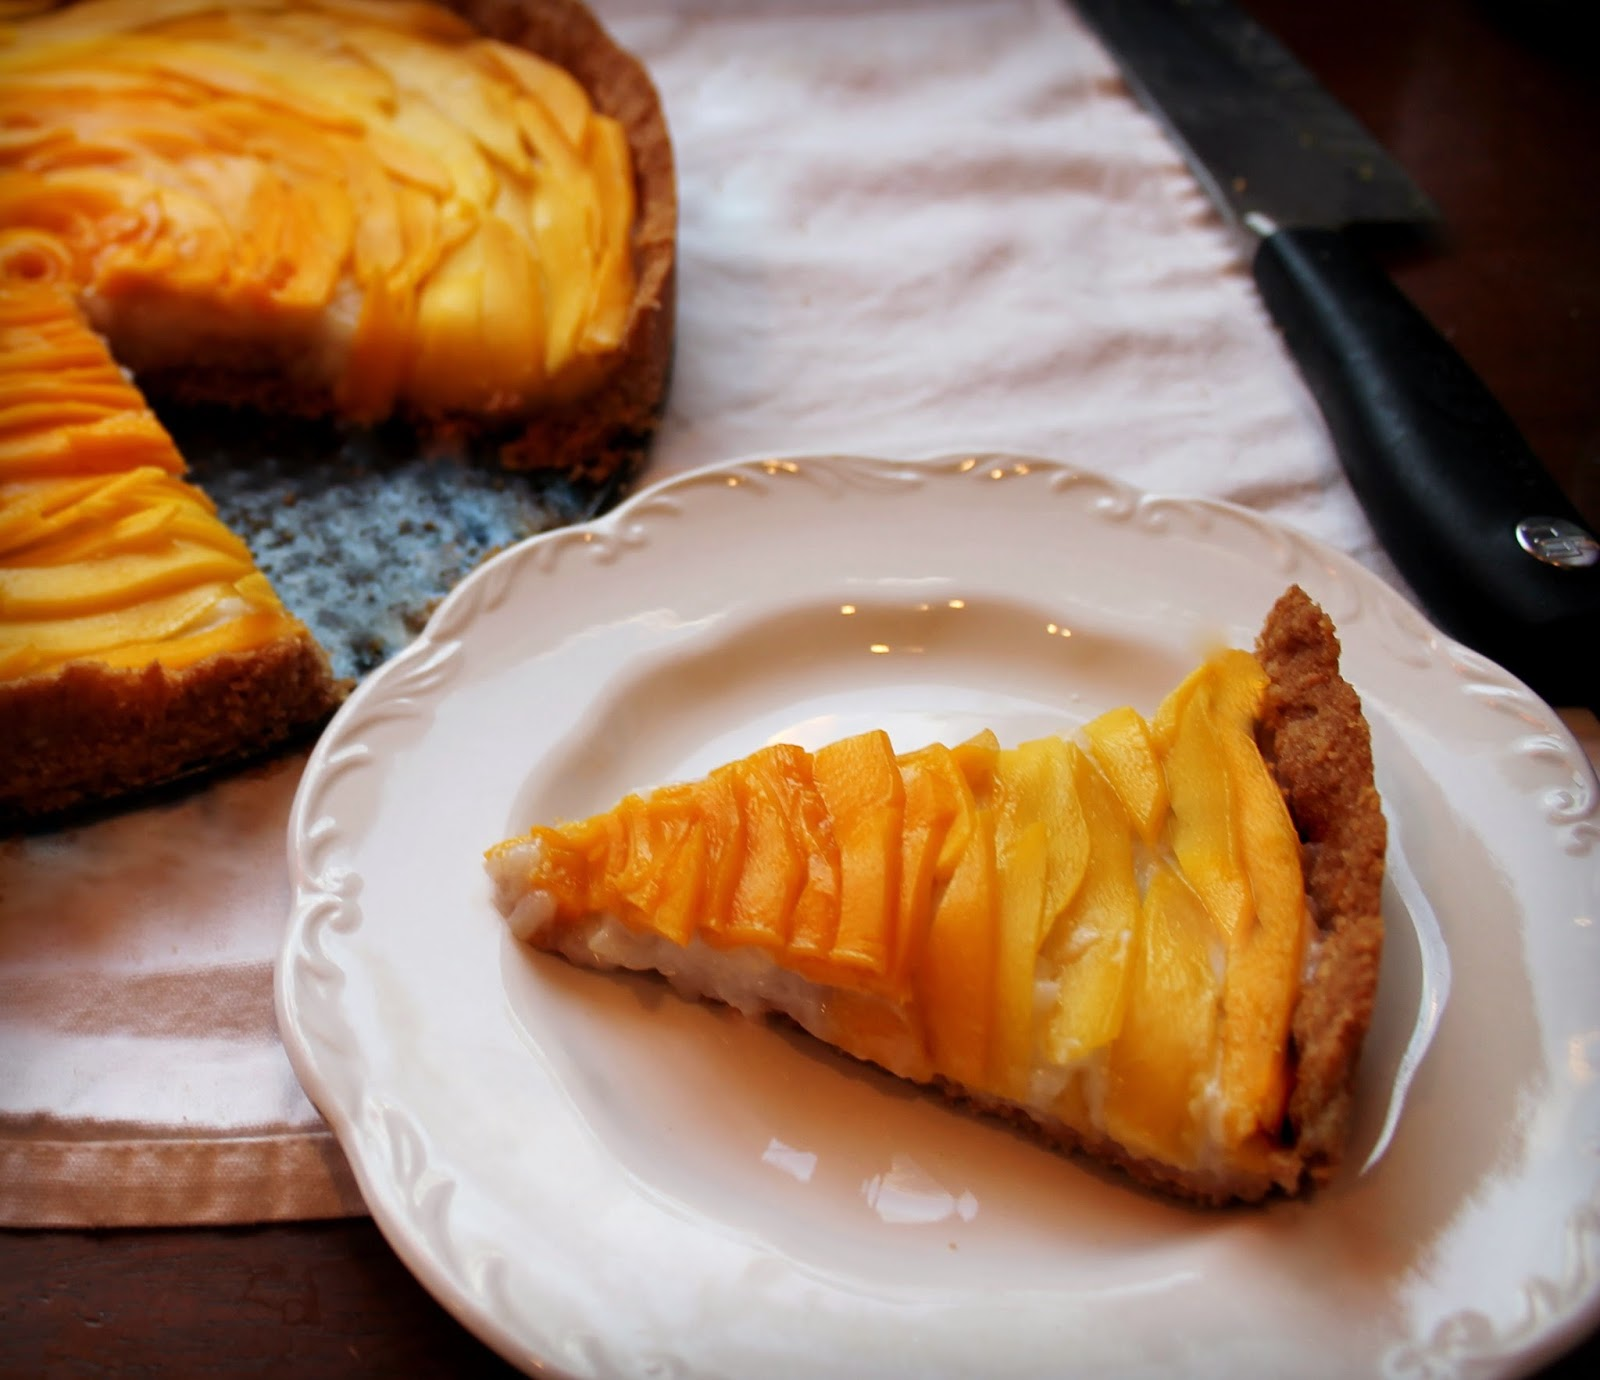 mango sticky rice inspired tart with coconut cashew crust crust